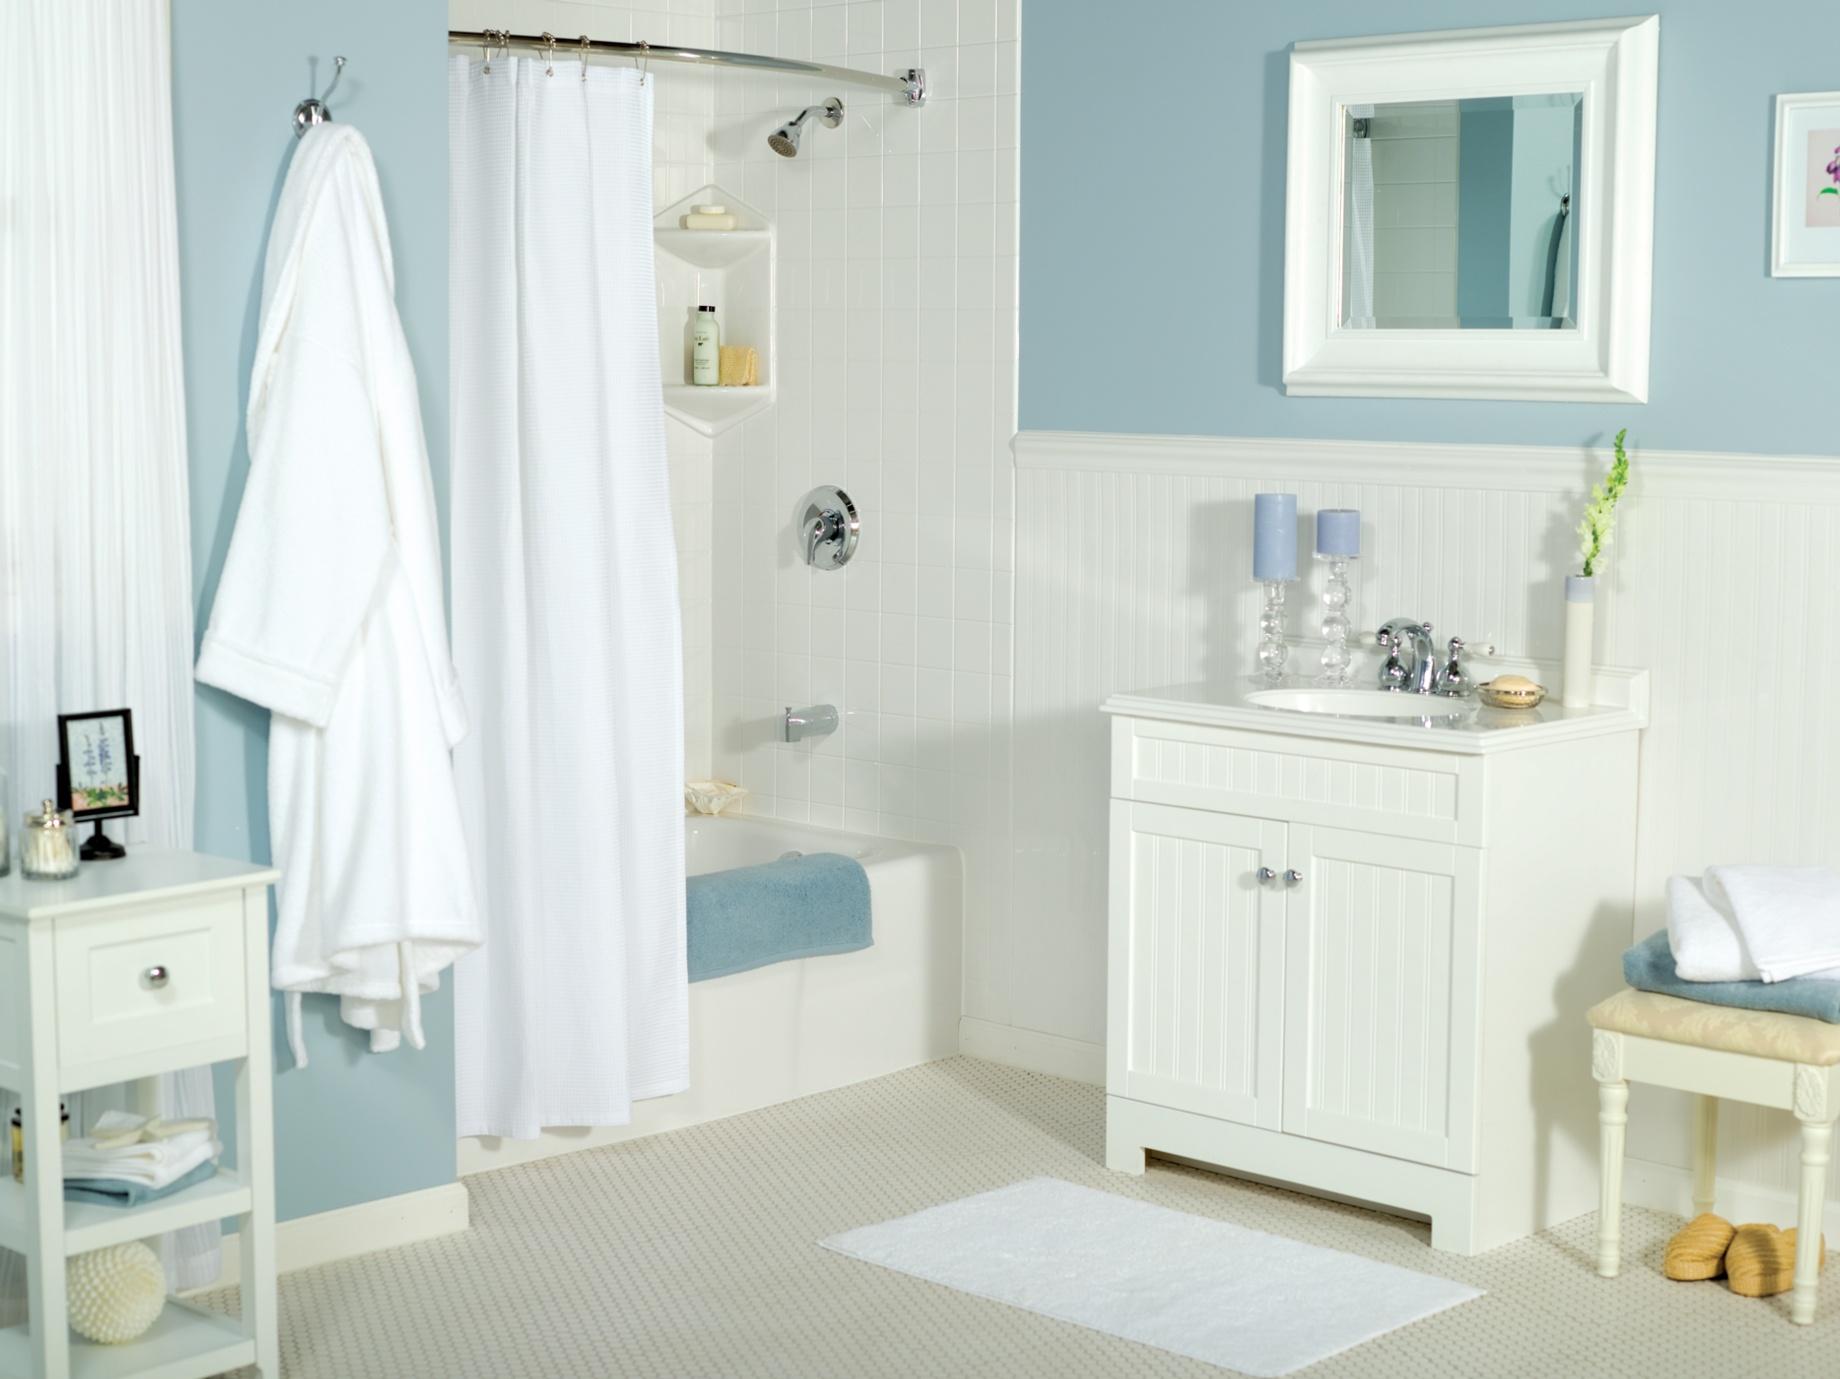 bathroom portfolio encore bath and shower dg venture aw window bn teal 016 dg venture aw window bn teal 016 qt gibraltar 8x10 prairie 1 qt gibraltar 8x10 prairie 1 rm3 ls1